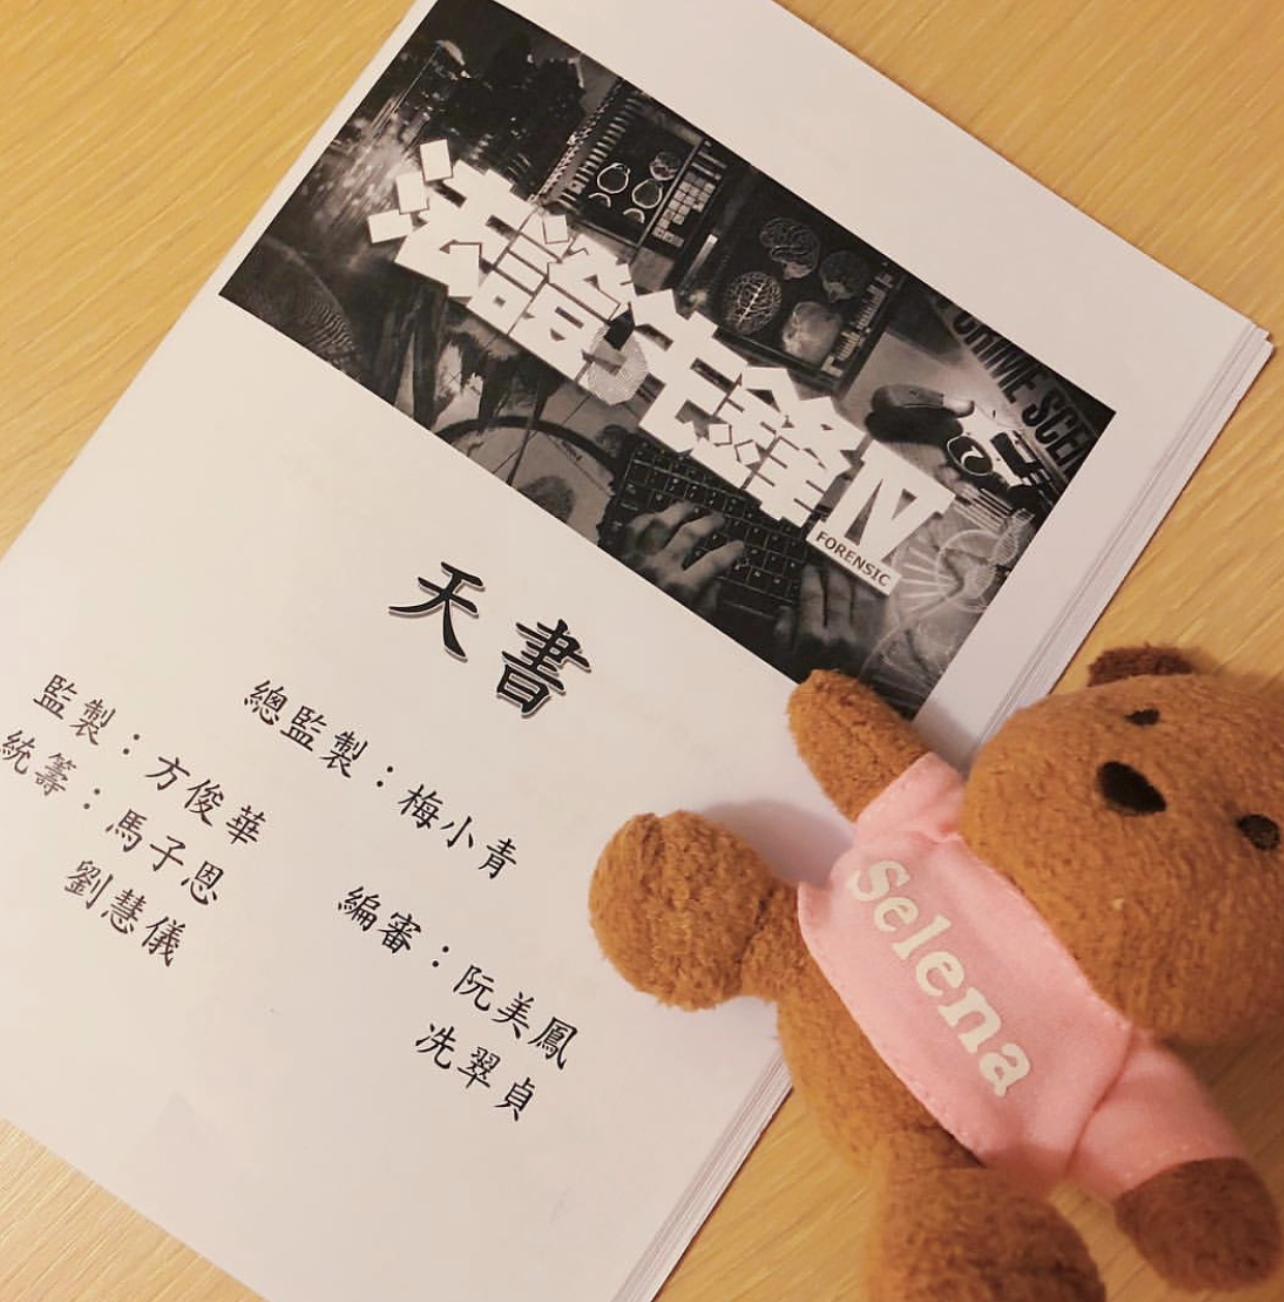 TVB落实开拍《法证先锋5》,佘诗曼有望出演,保留前四部精髓